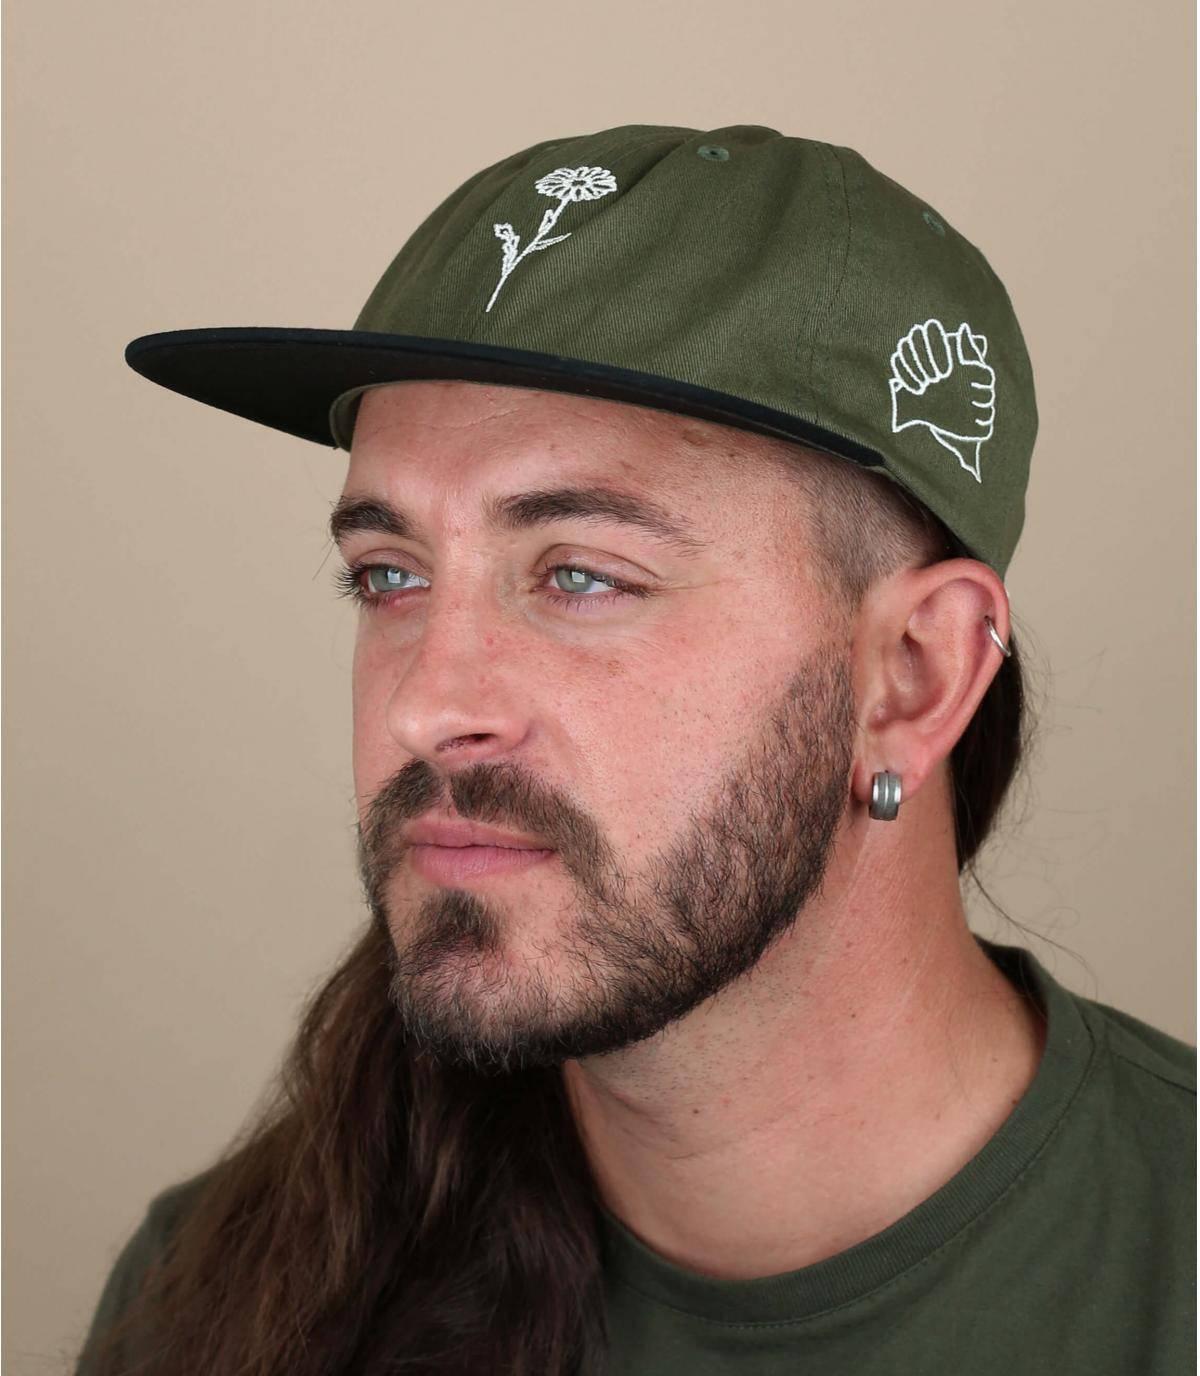 Green cap Obey